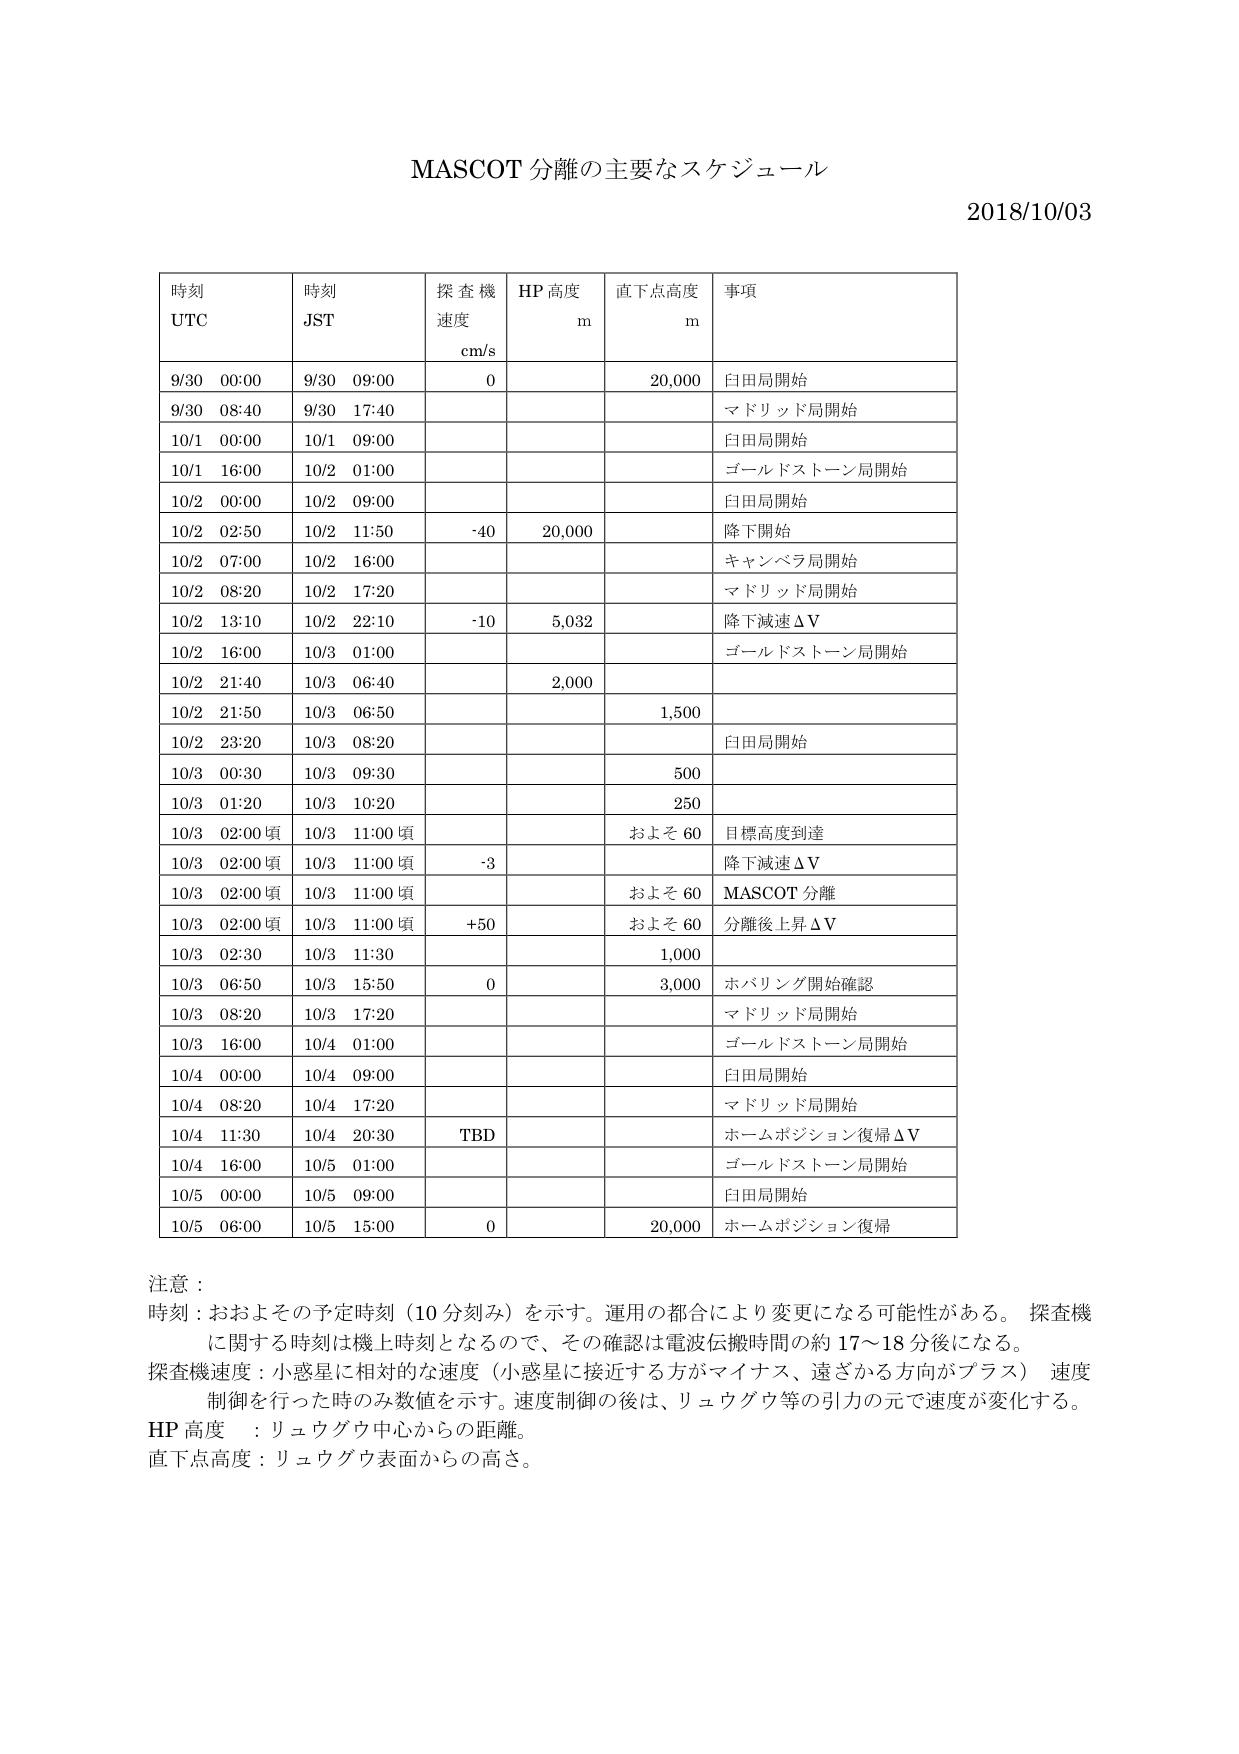 f:id:Imamura:20181003145256p:plain